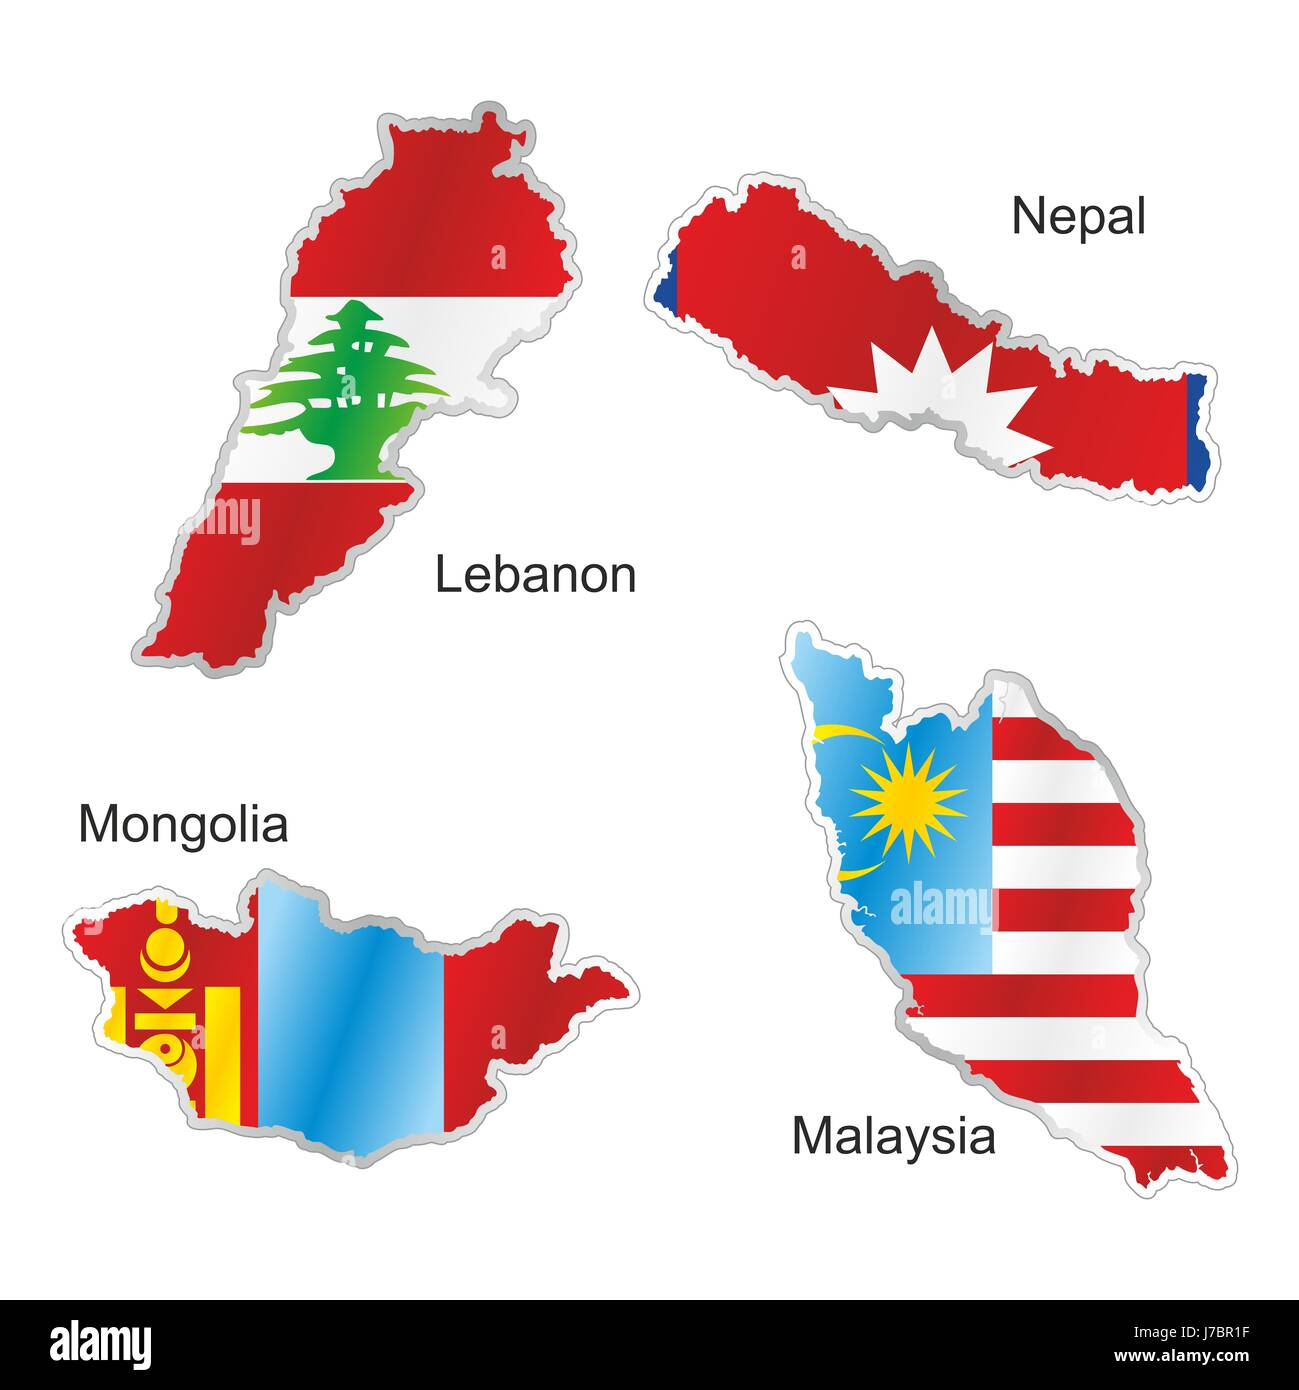 asia mongolia malaysia flag nepal lebanon map atlas map of the